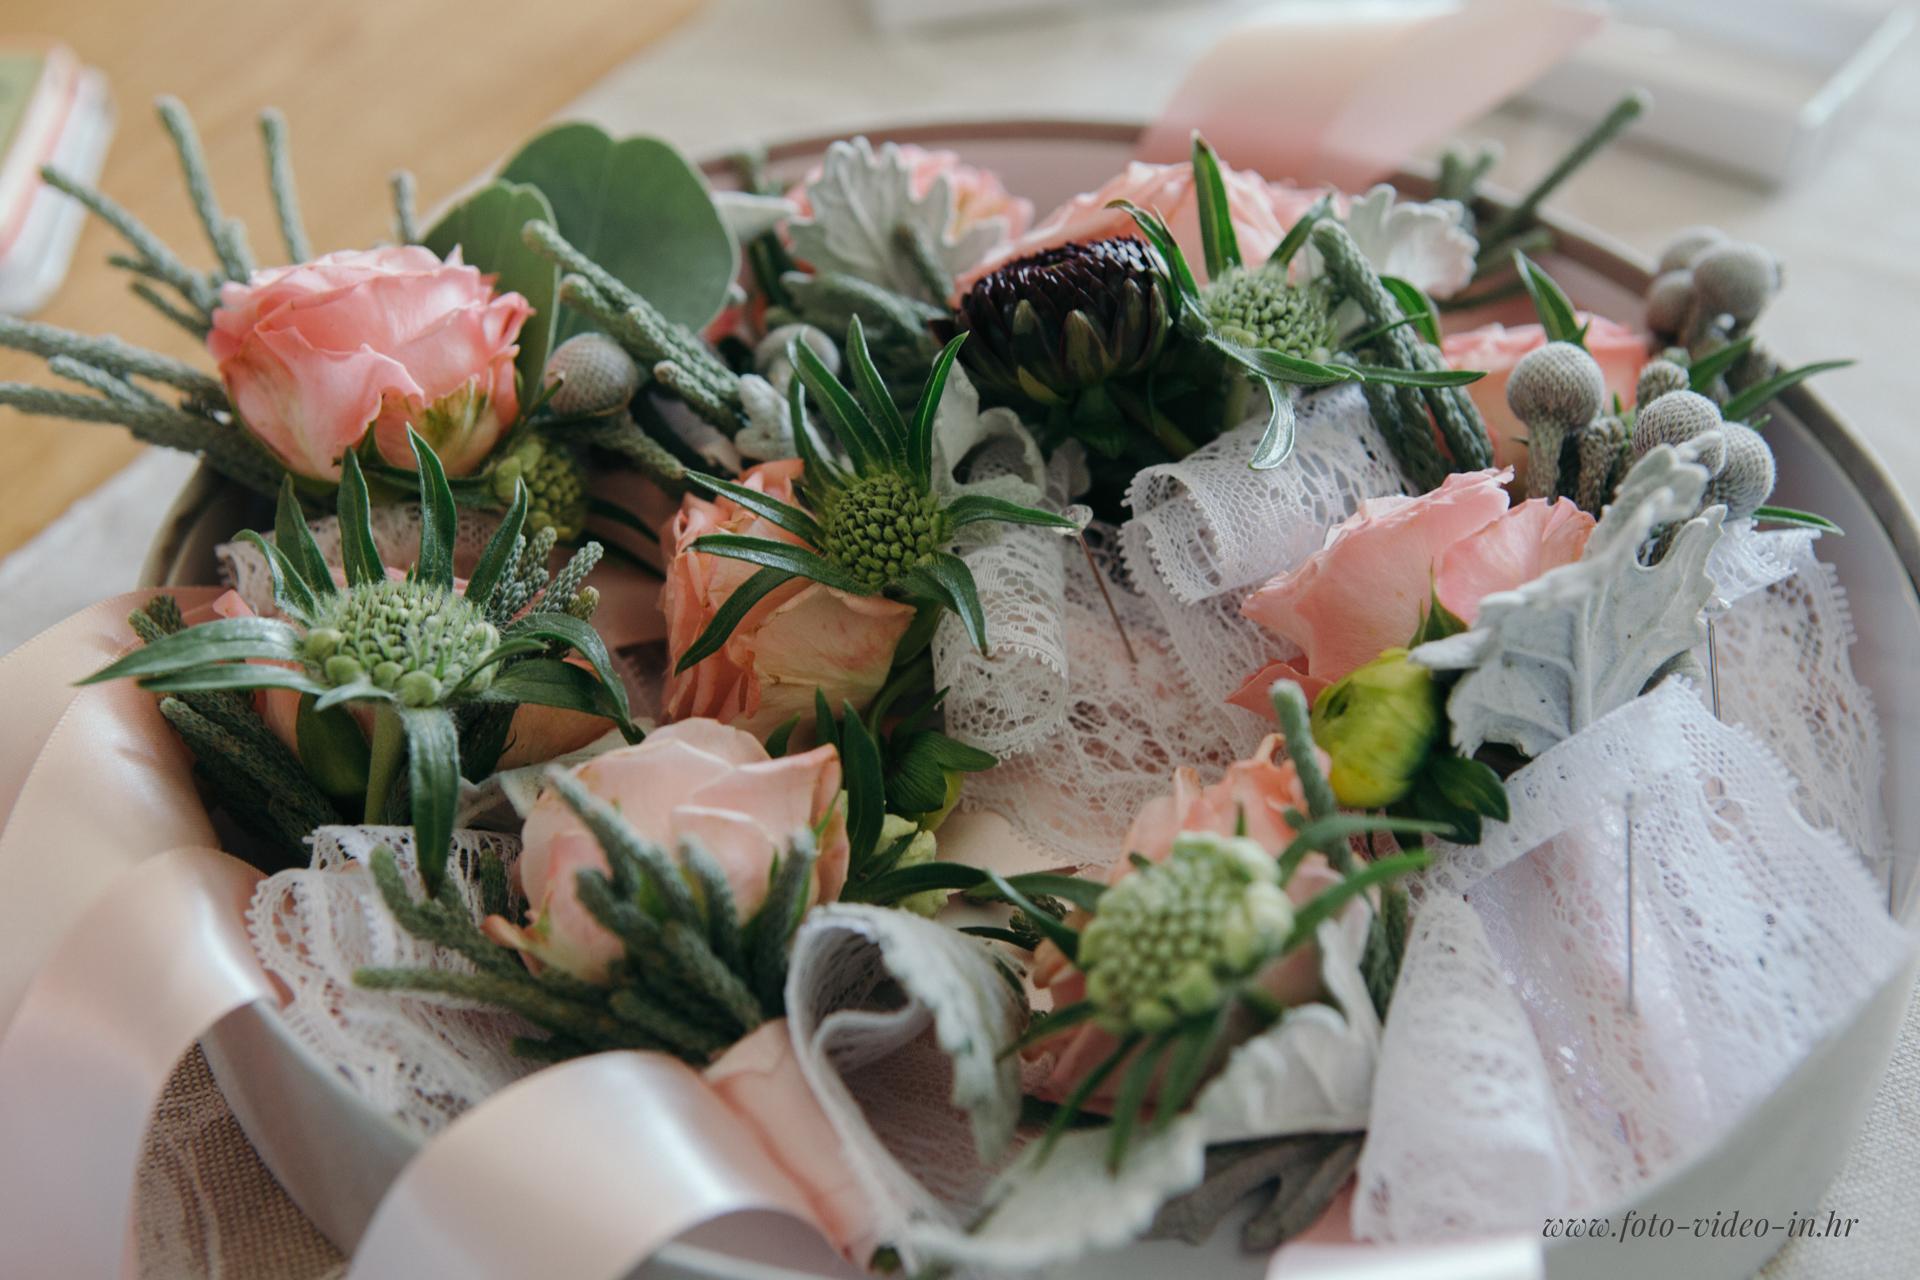 vjenčani buket sa ružama